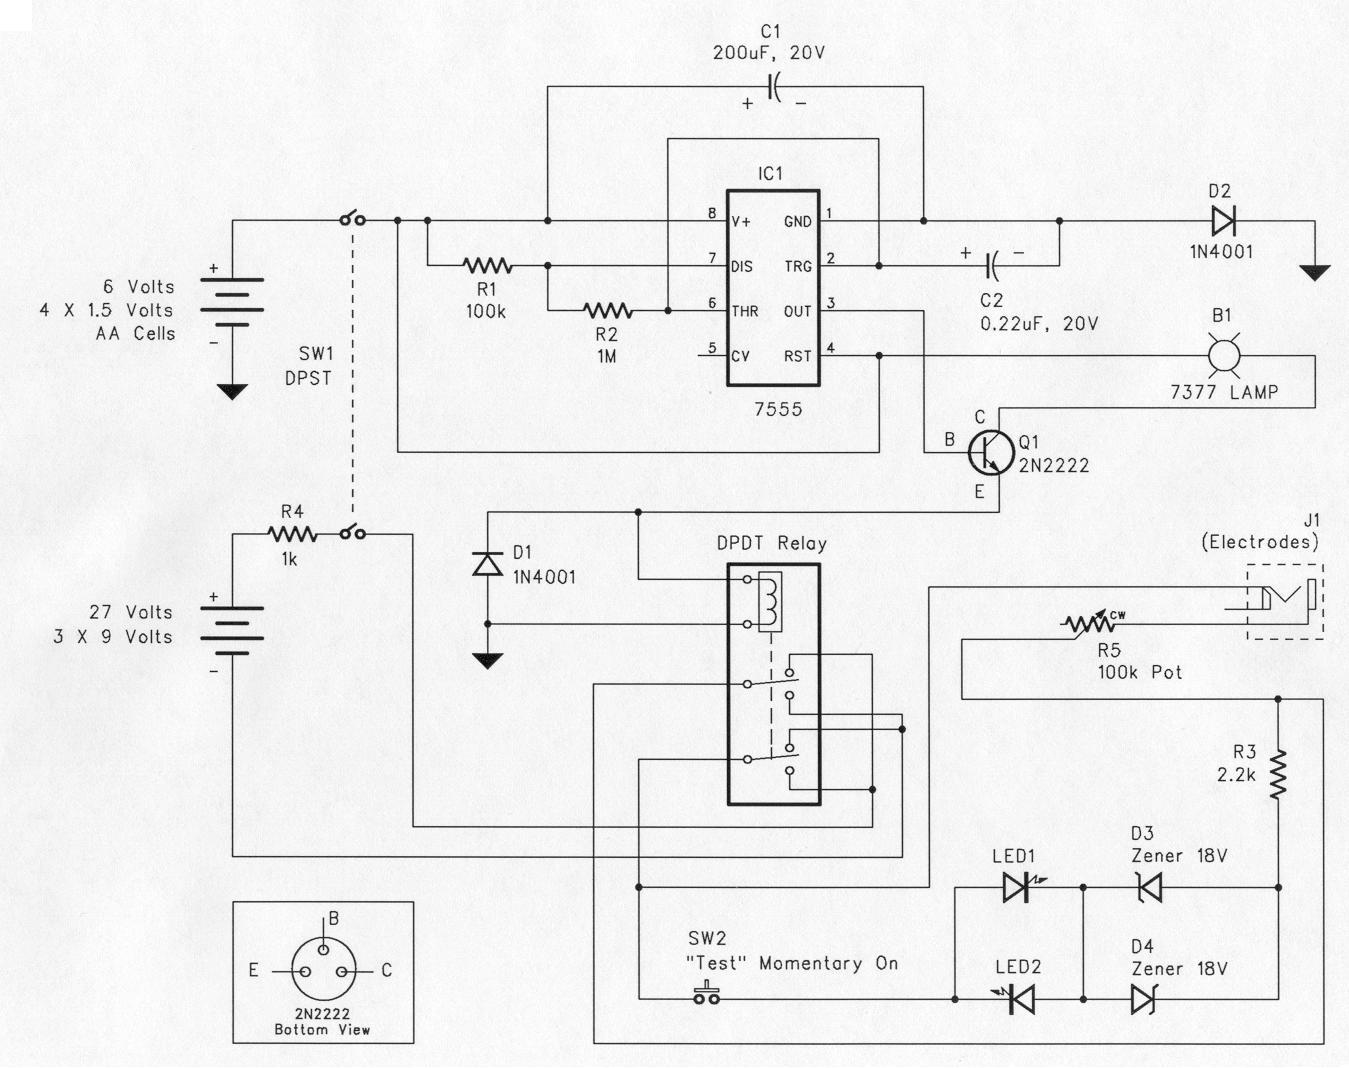 silver pulser ionic colloidal silver generator per research of dr rh teslatech com